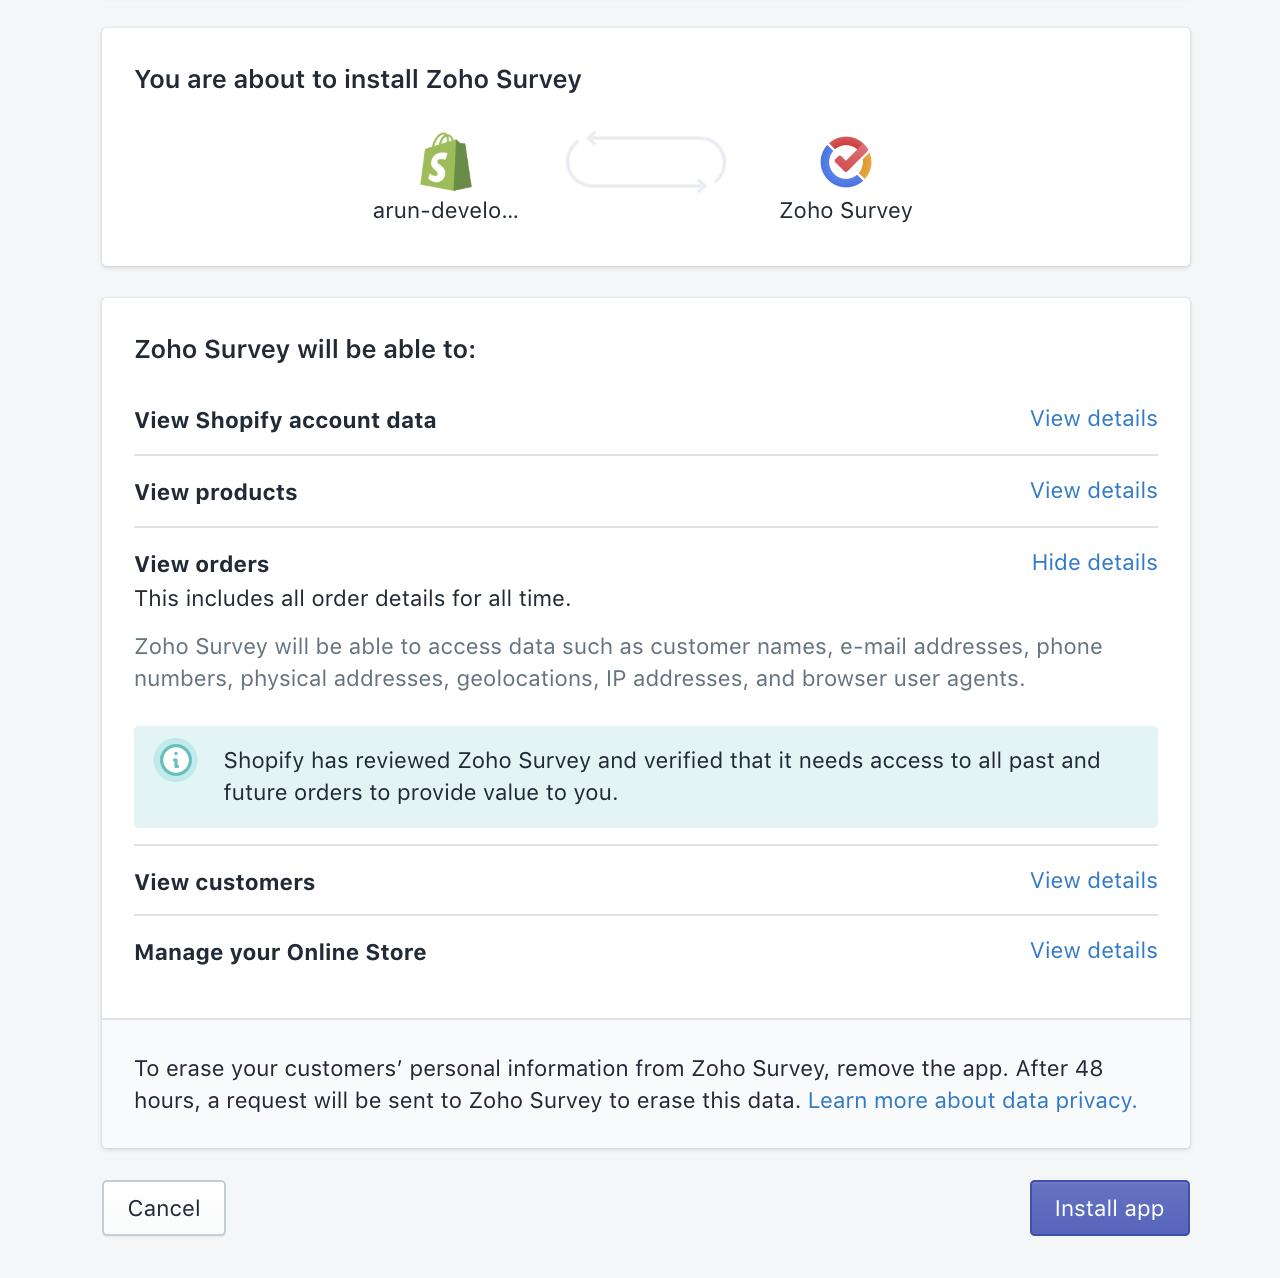 Zoho Survey Shopify install app